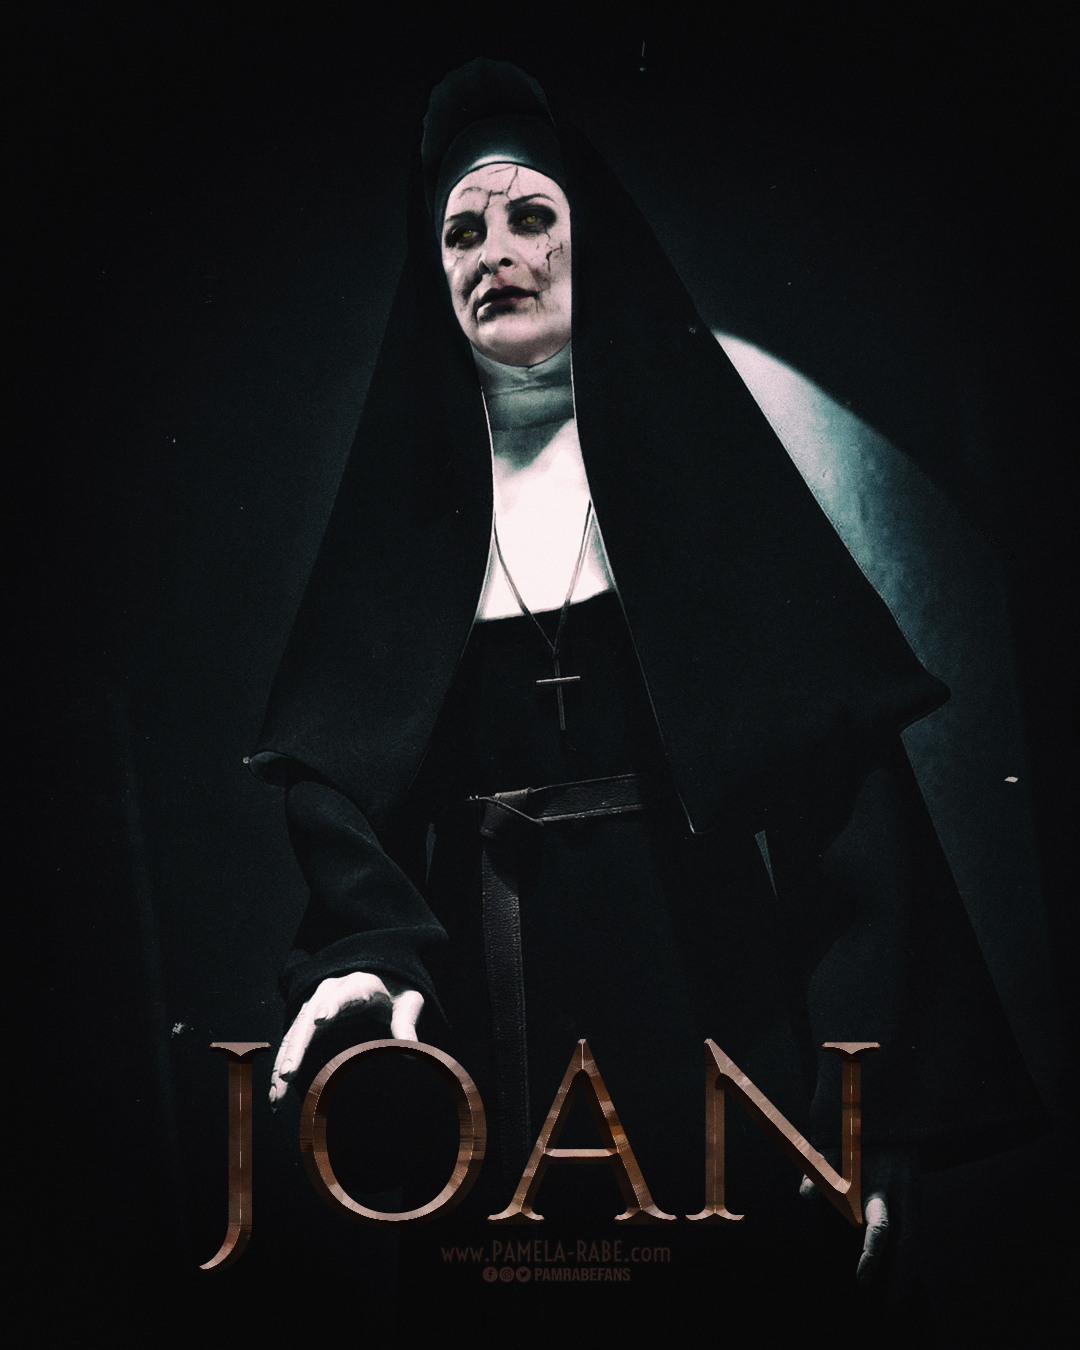 Pamela Rabe | Joan Ferguson as The Nun/Valak | Happy Halloween 2019